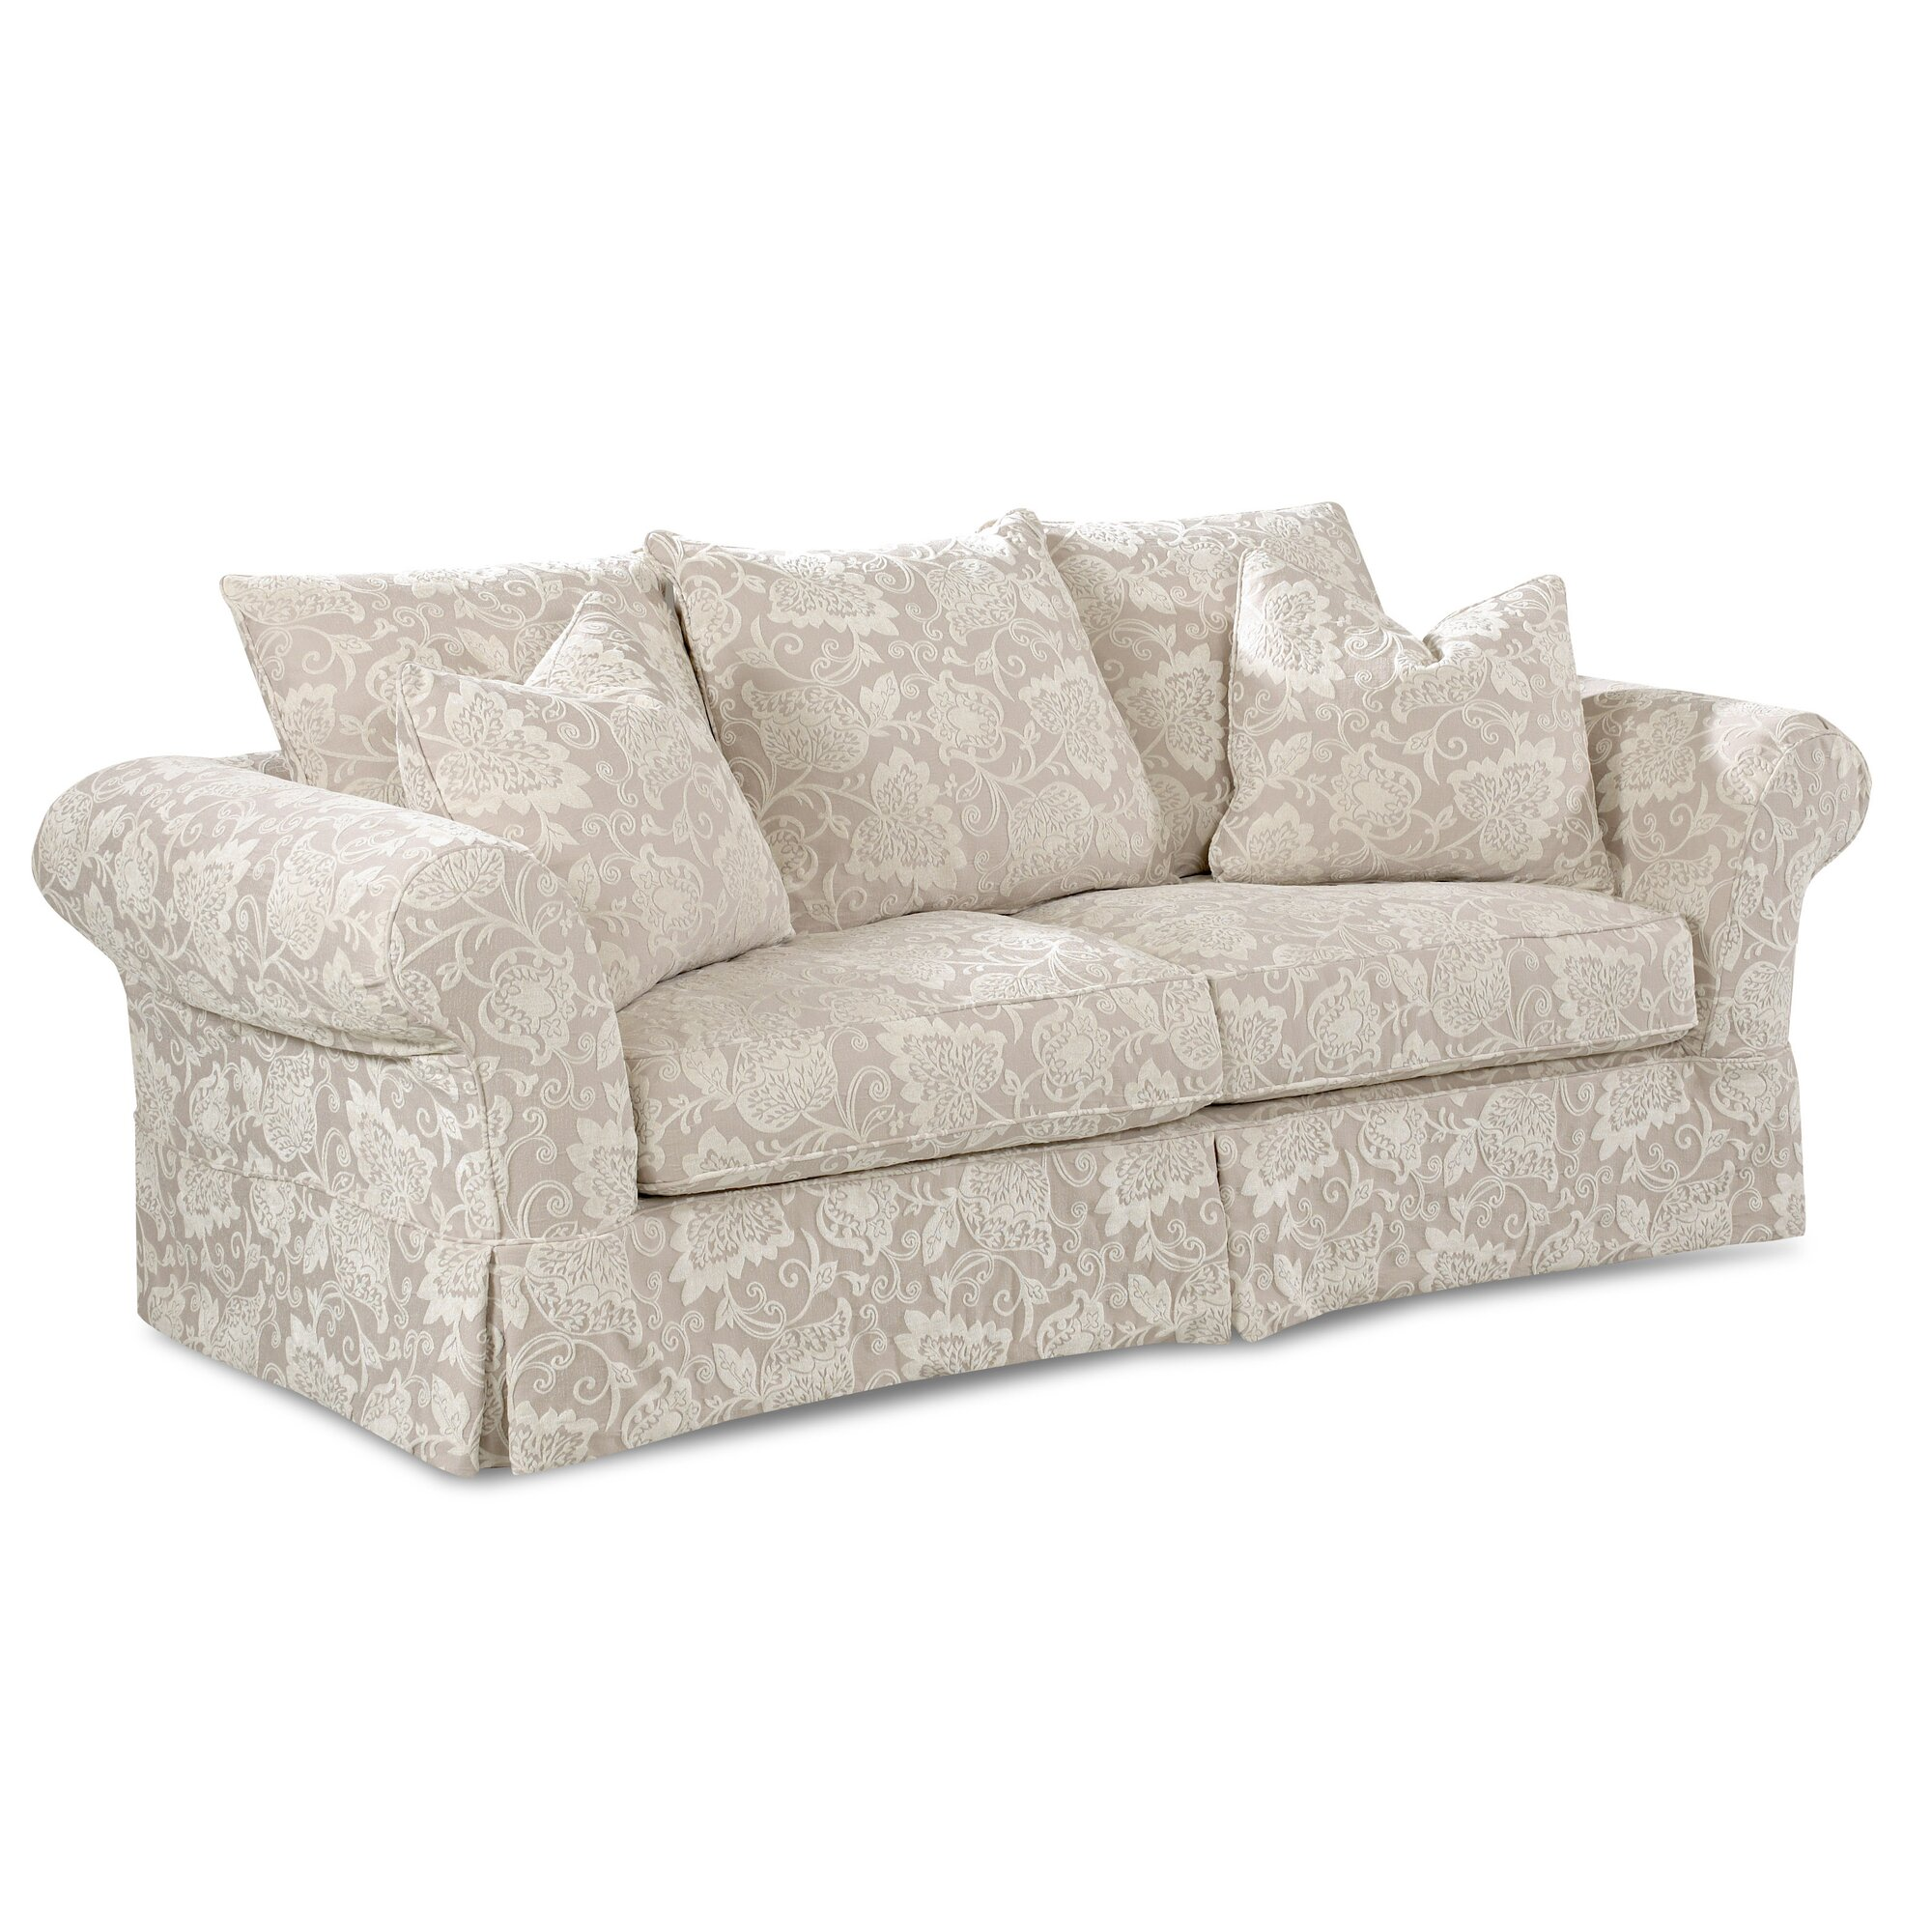 Chenille Skirted Sofa: Klaussner Furniture Bond Sofa & Reviews